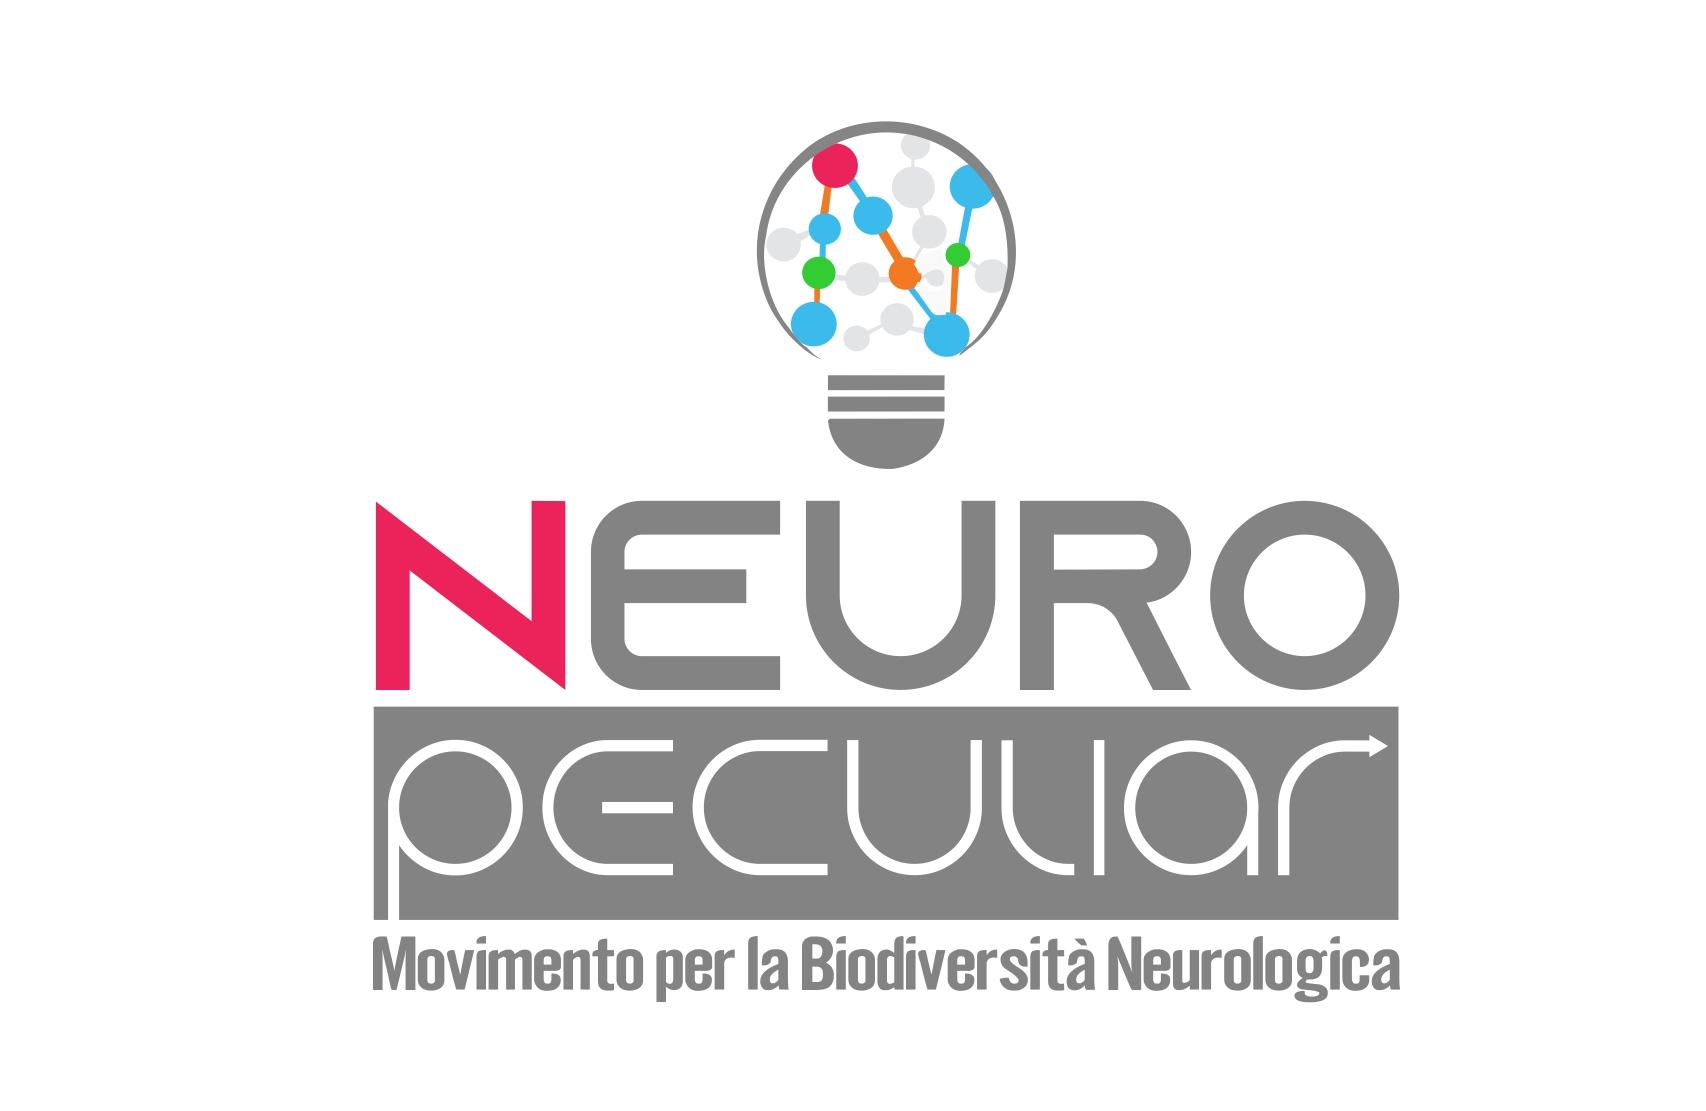 Neuropeculiar Milano